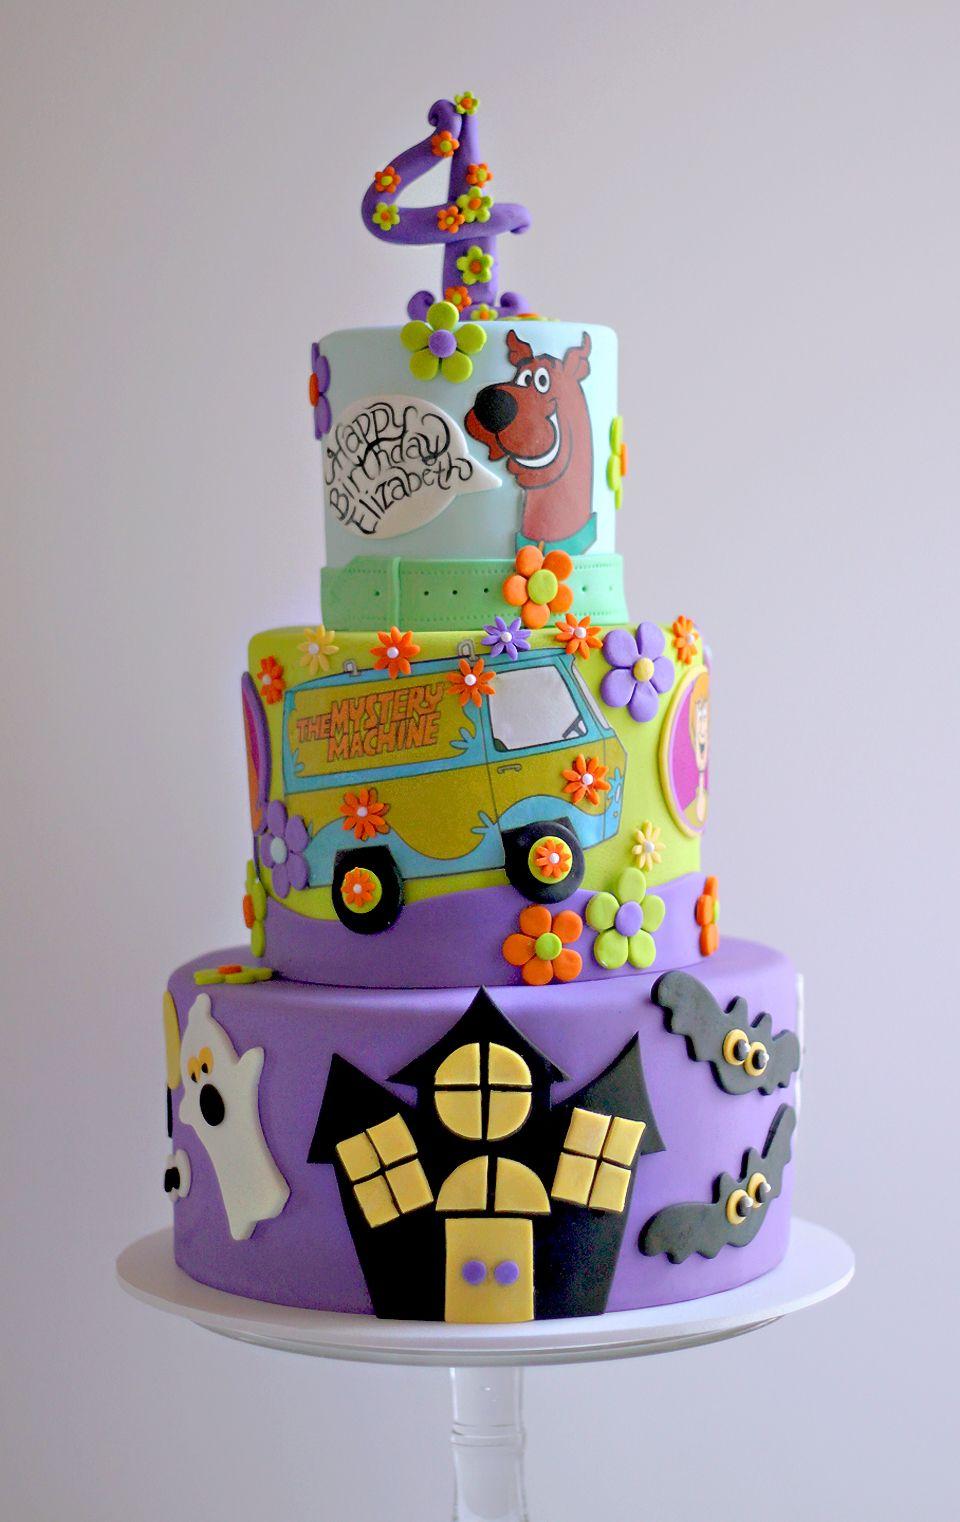 ScoobyDoo Birthday Scooby doo birthday cake Scooby doo cake and